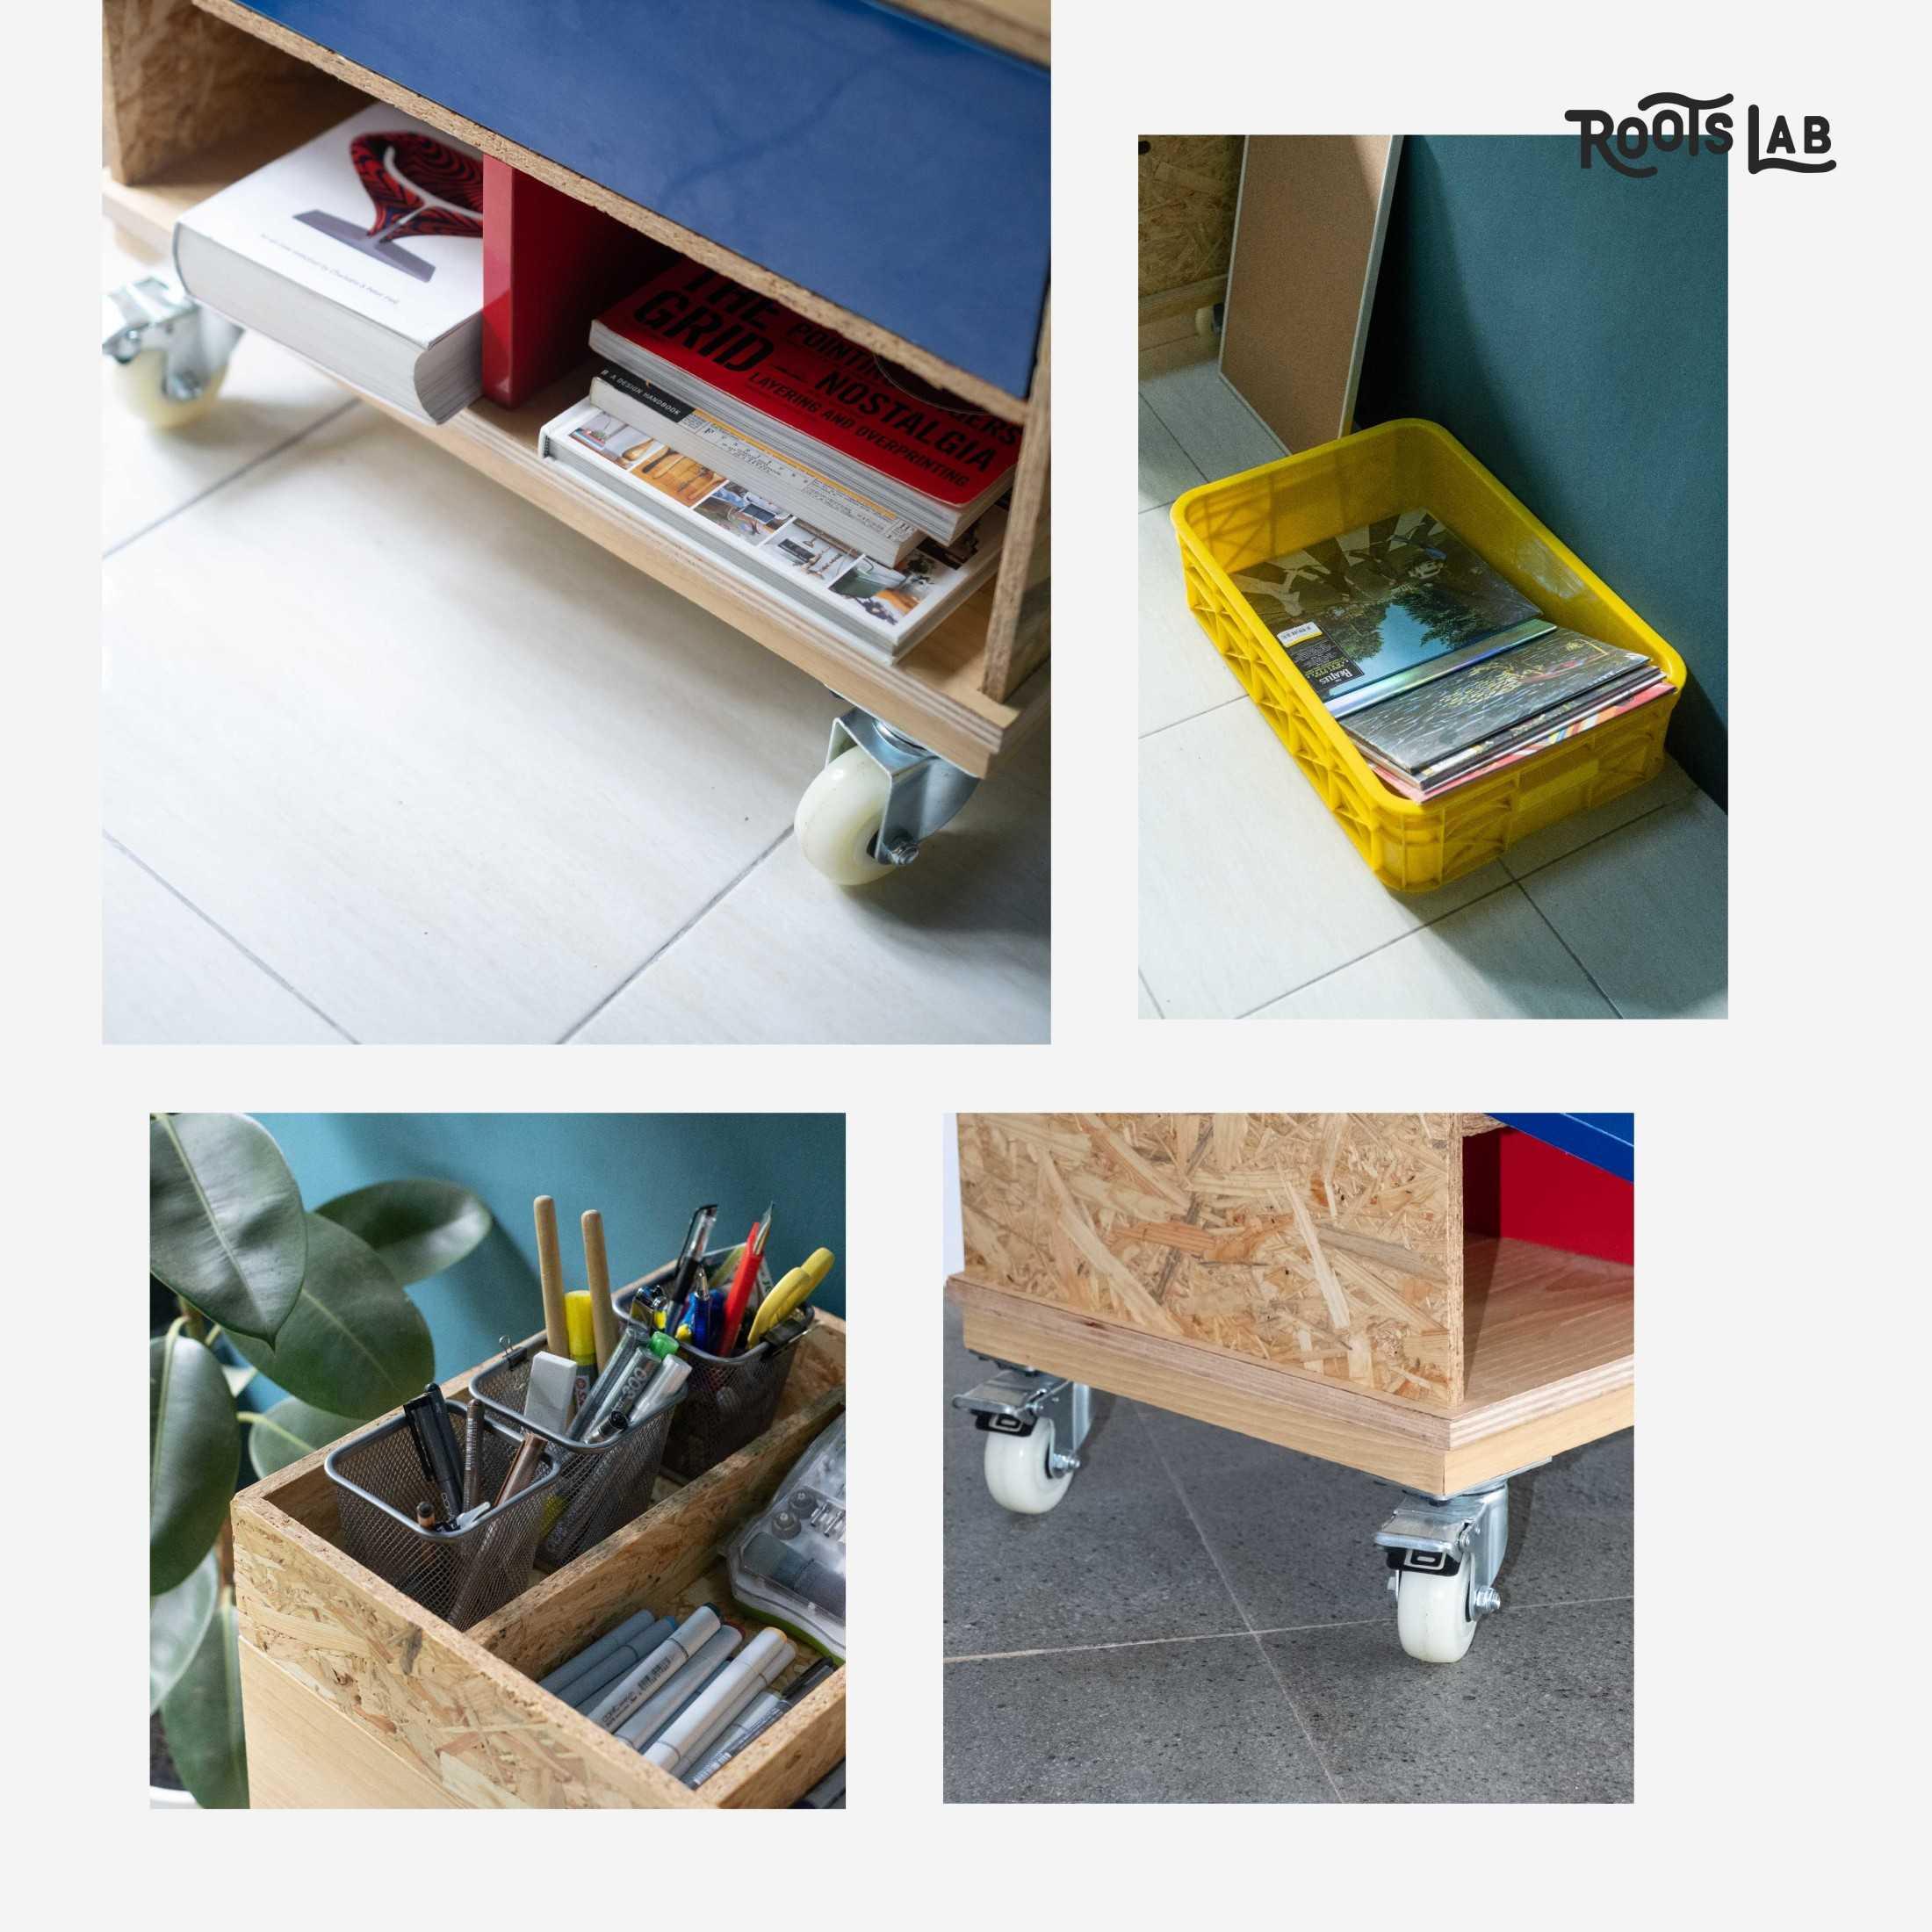 Rootslab Furniture & Craft Project Bekasi, Kota Bks, Jawa Barat, Indonesia Bekasi, Kota Bks, Jawa Barat, Indonesia Rolling Stacks Cabinet Industrial 113032